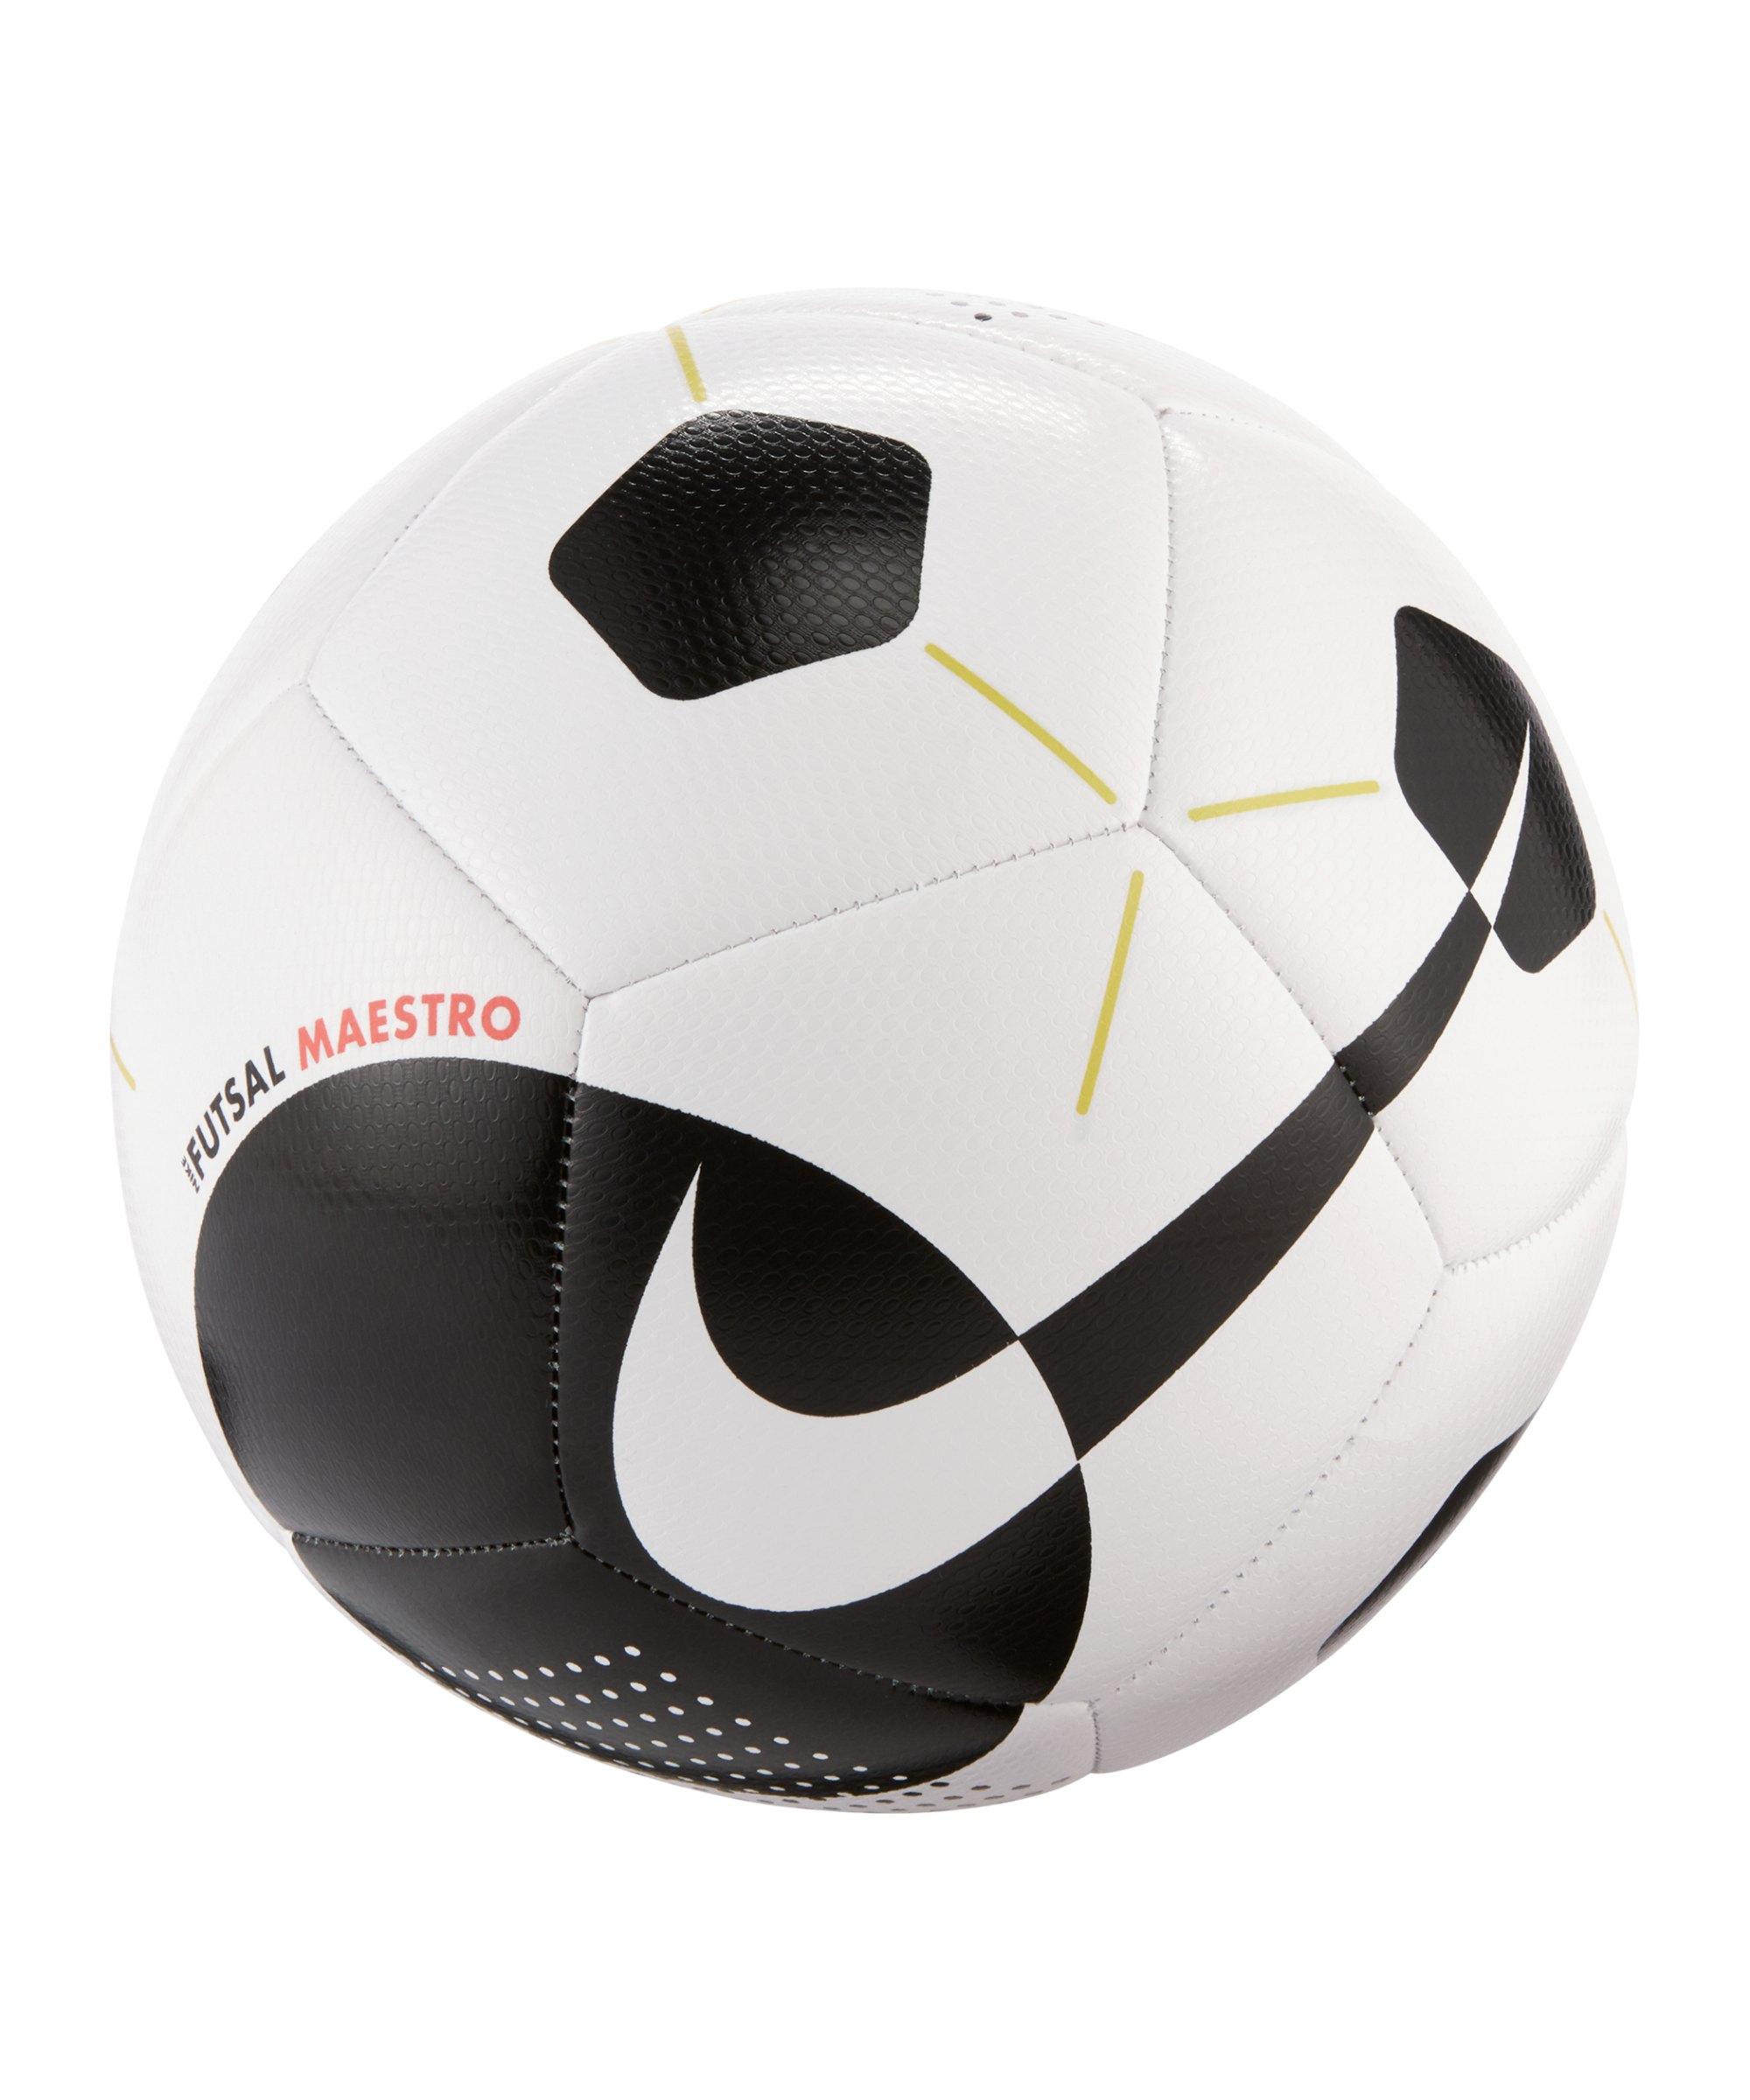 Nike Maestro Trainingsball Weiss Schwarz F104 - weiss